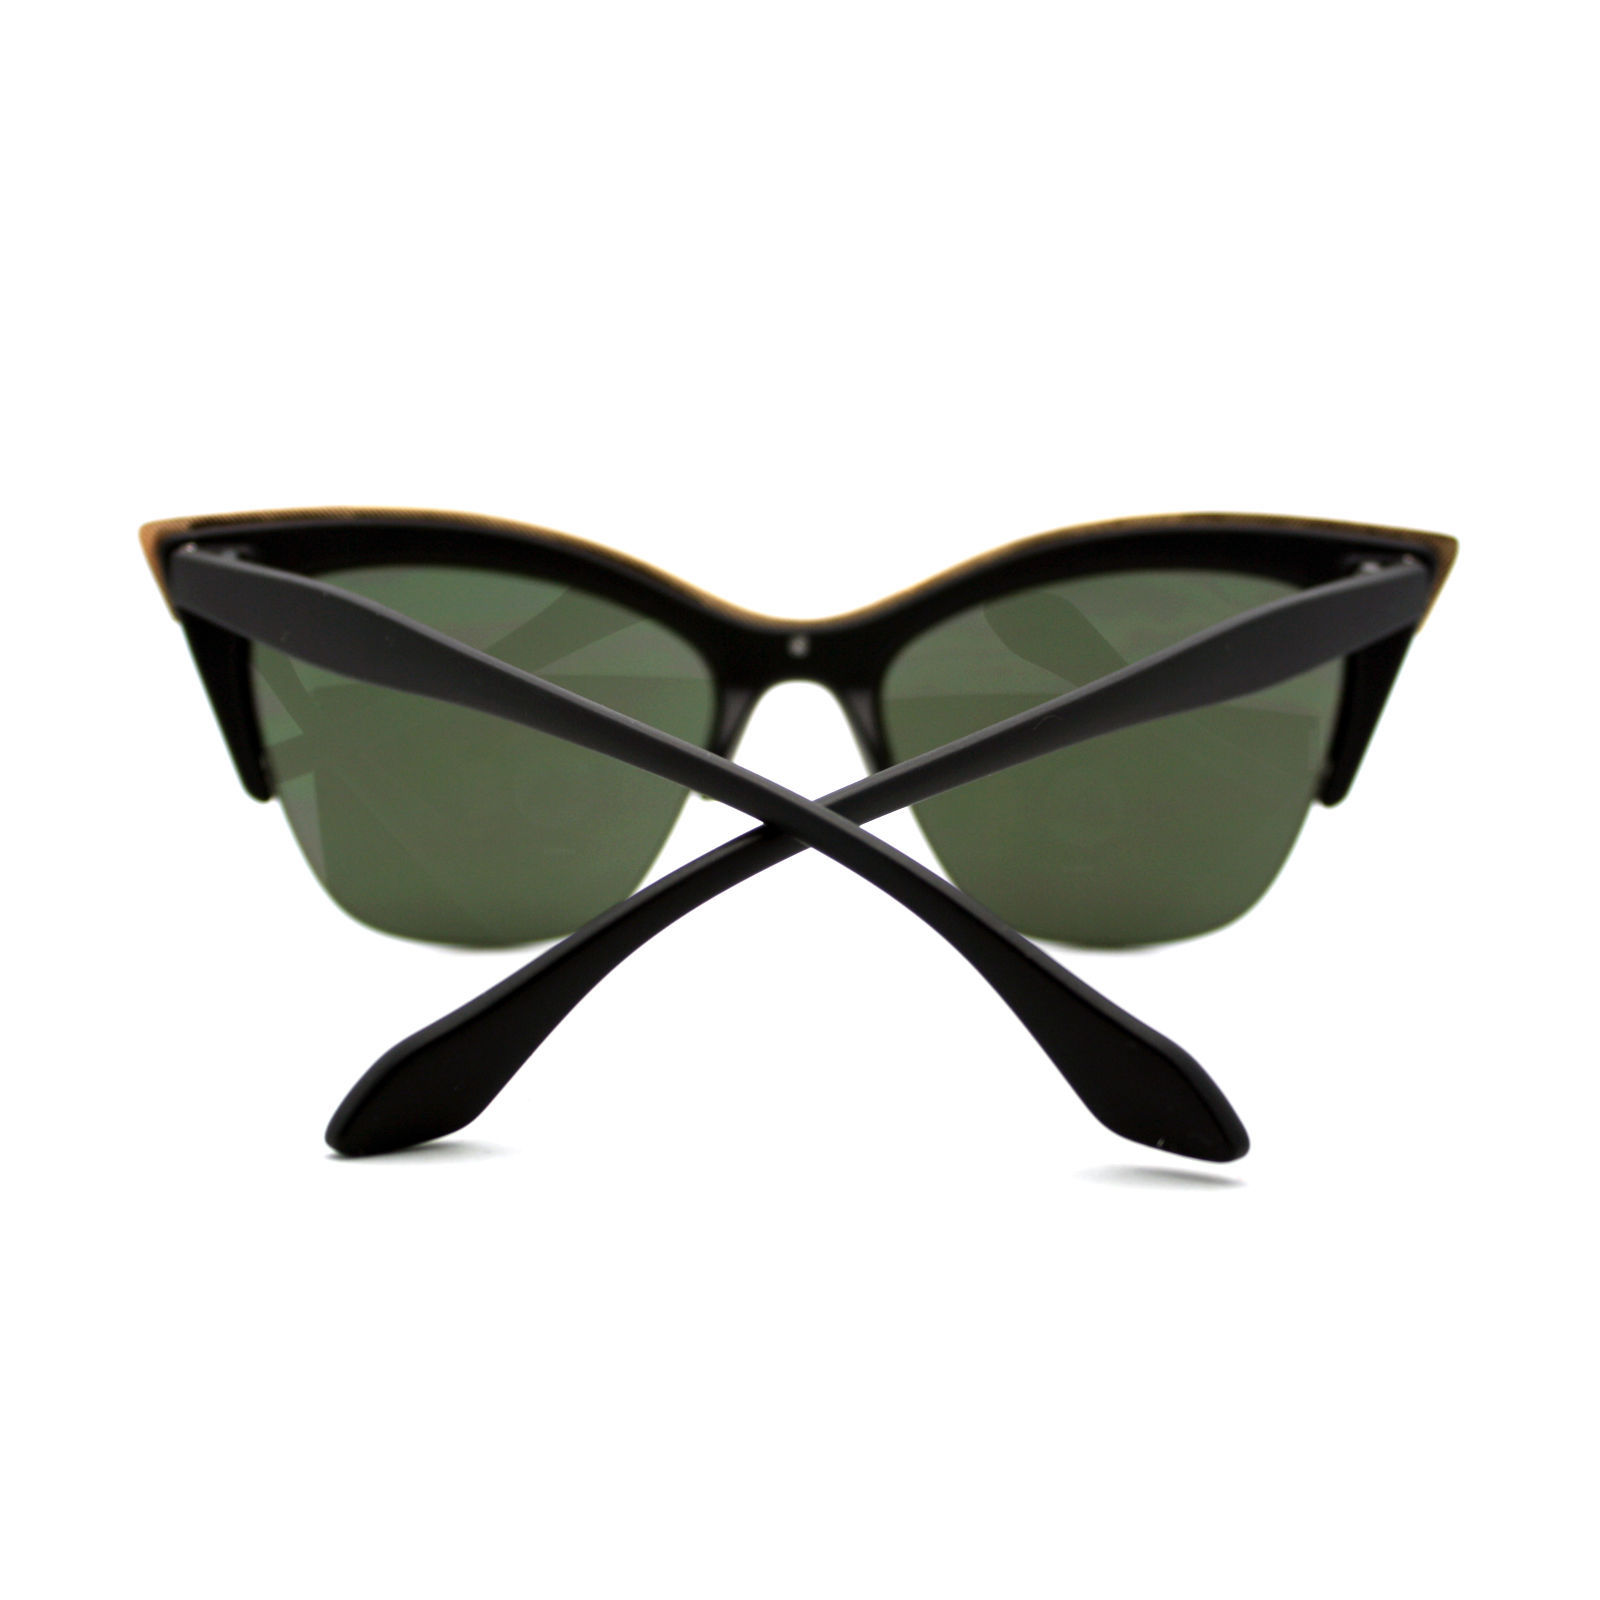 Stylish Womens Sunglasses Half Rim Cateye Designer Fashion Shades